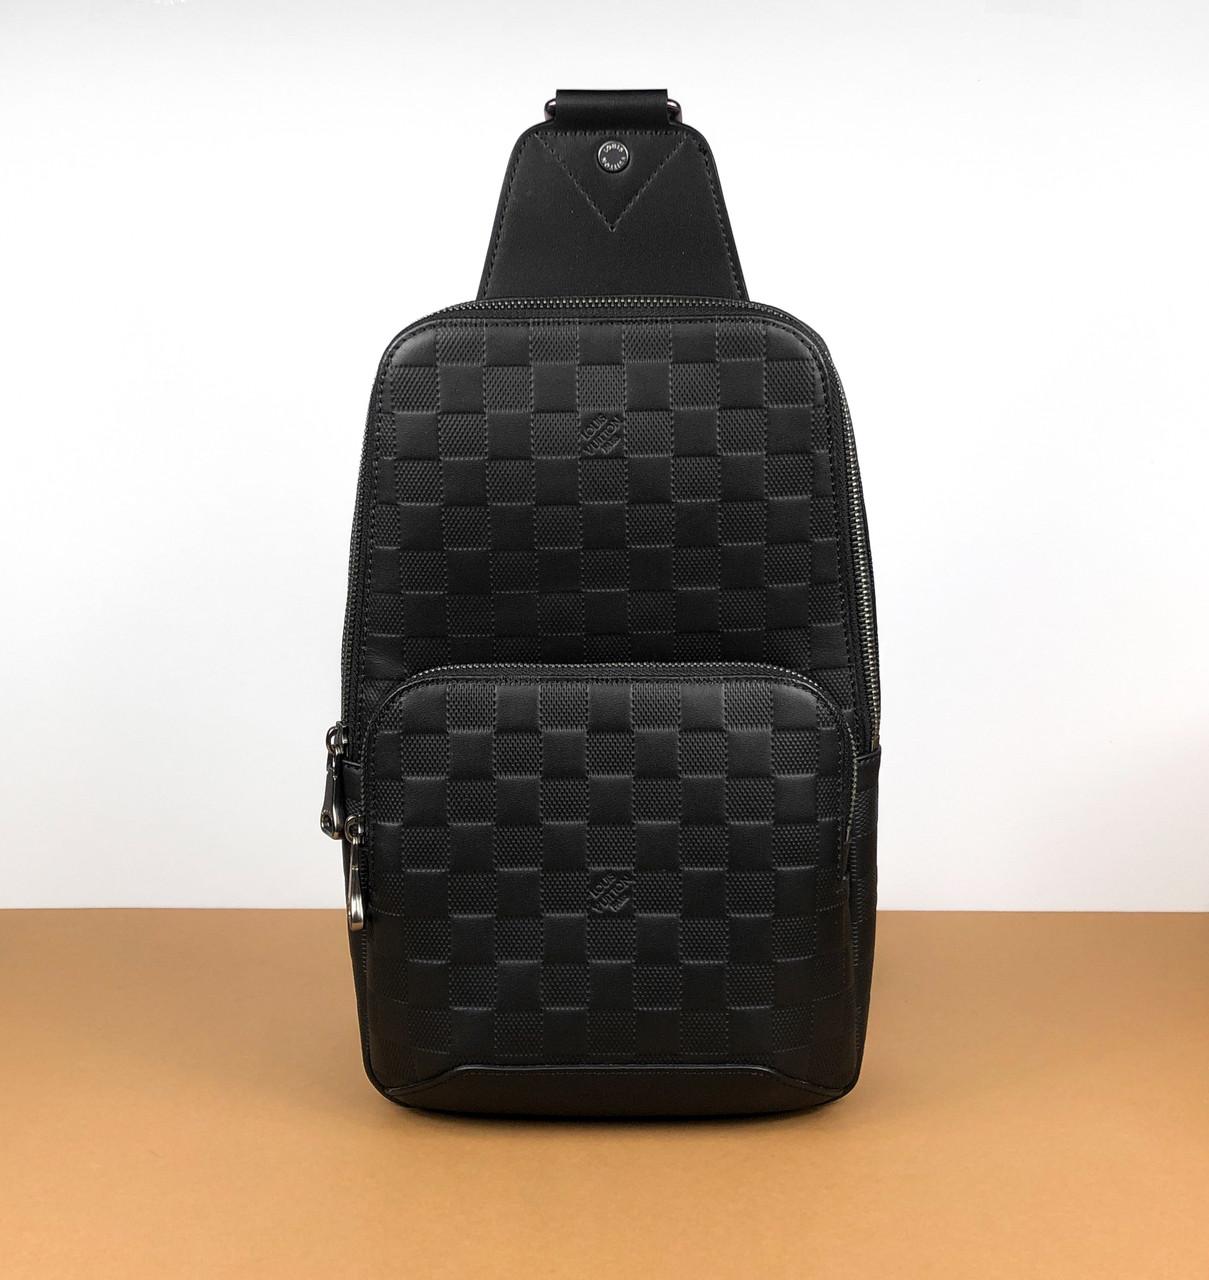 Сумка слинг Louis Vuitton - Damier Infini